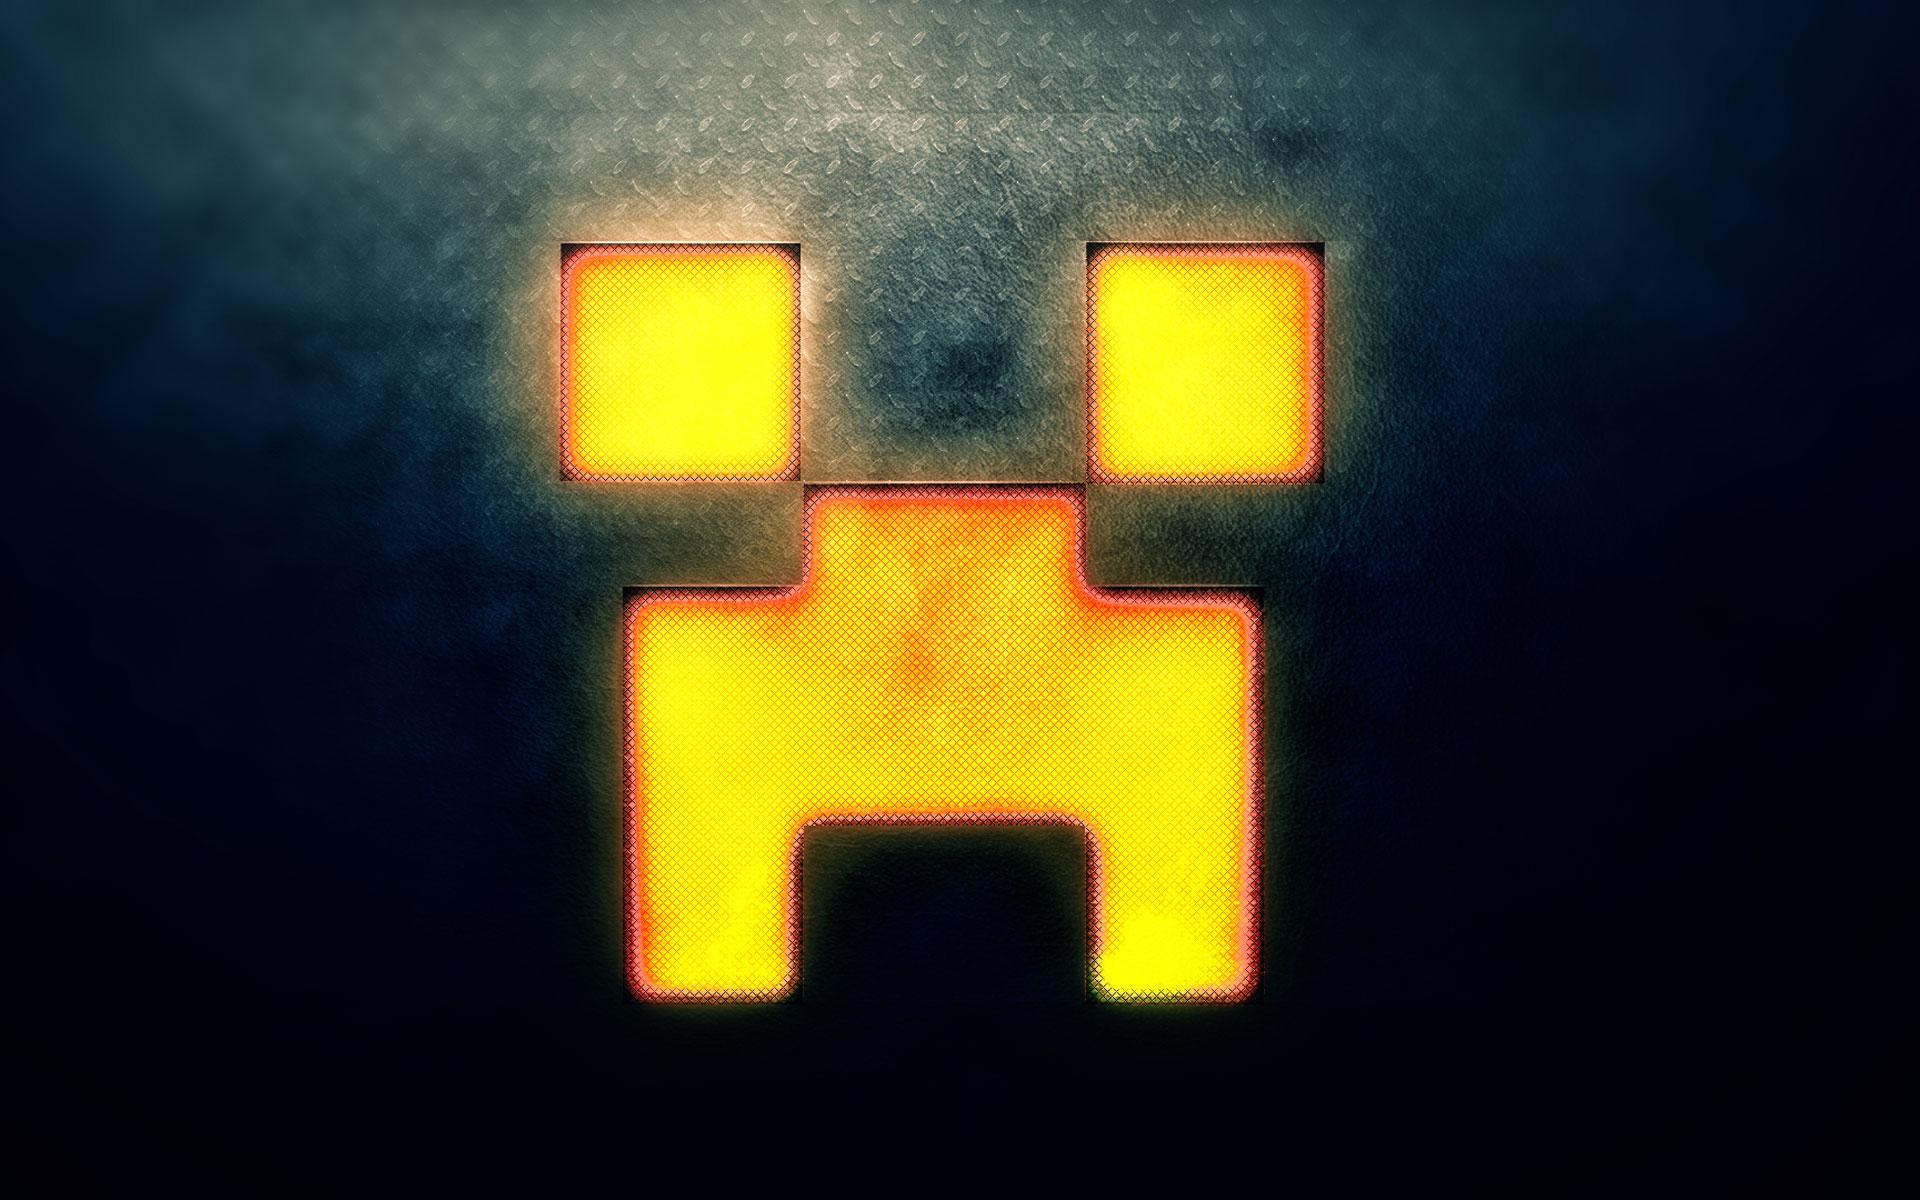 Minecraft Wallpaper Creeper 3d Minecraft Creeper Diamond Hd Desktop Wallpapers 4k Hd